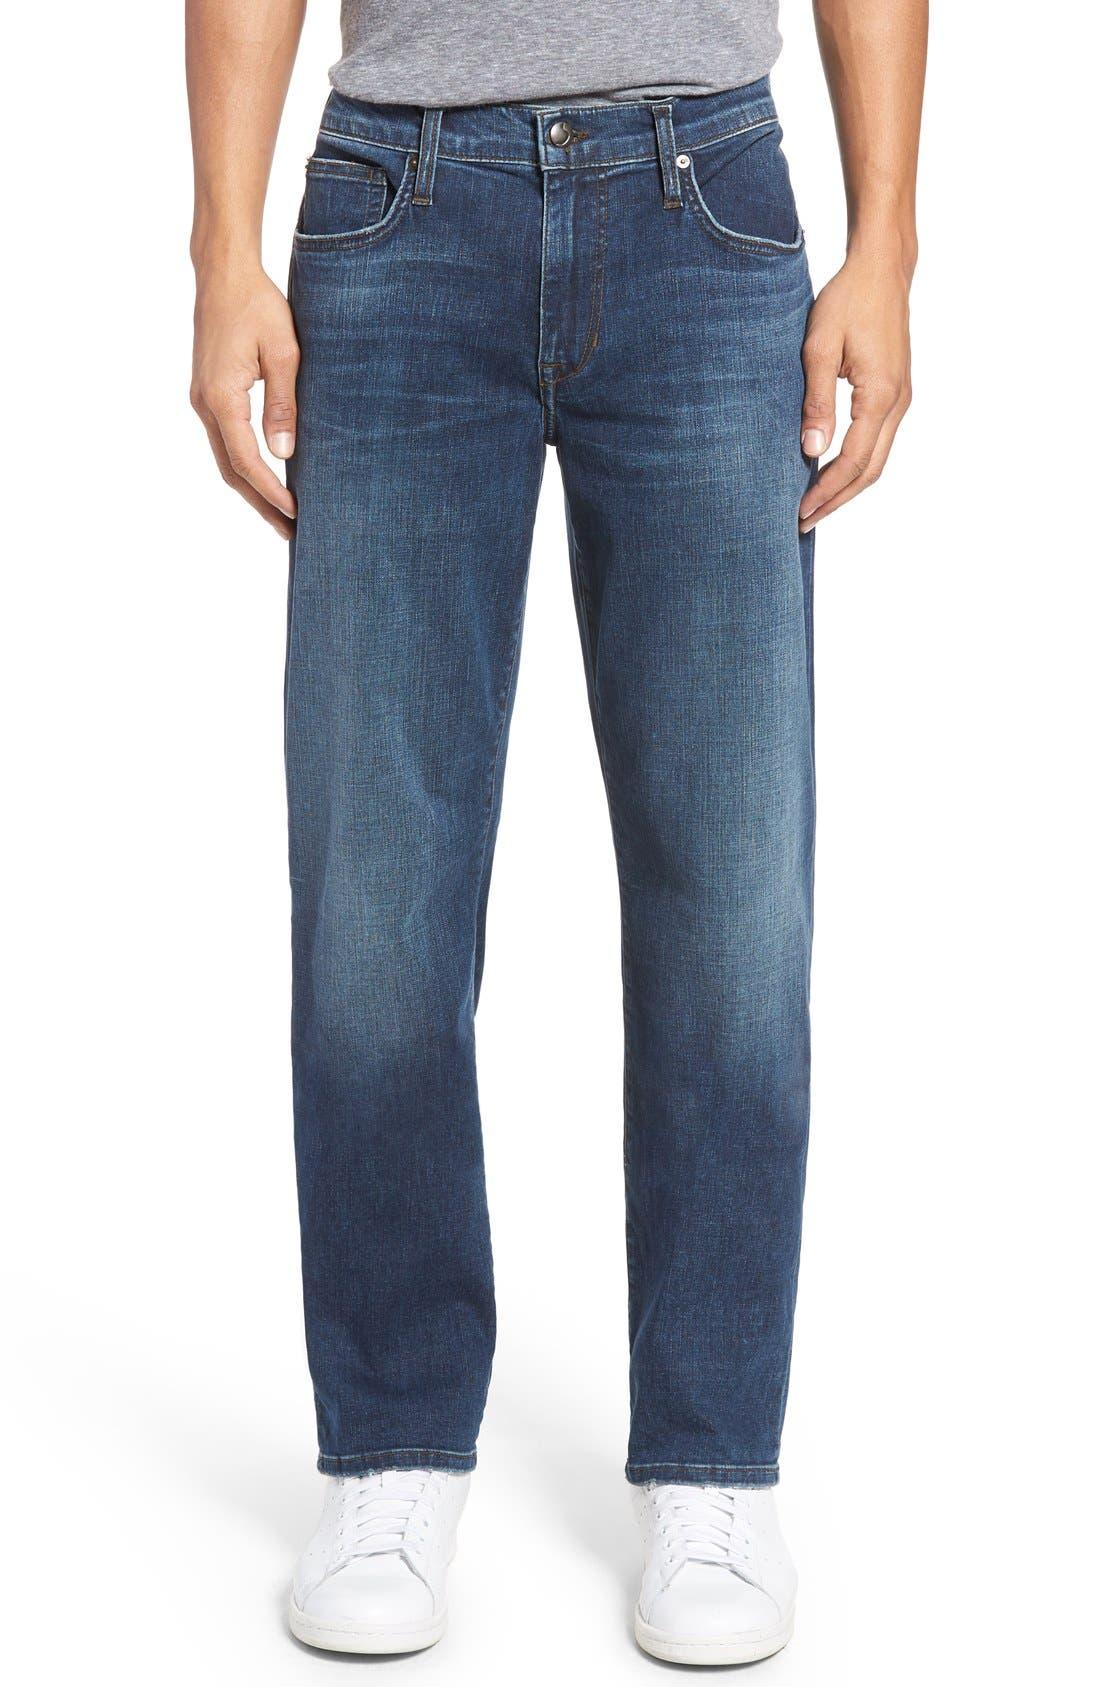 Alternate Image 1 Selected - Joe's Brixton Slim Fit Jeans (Gladwin)